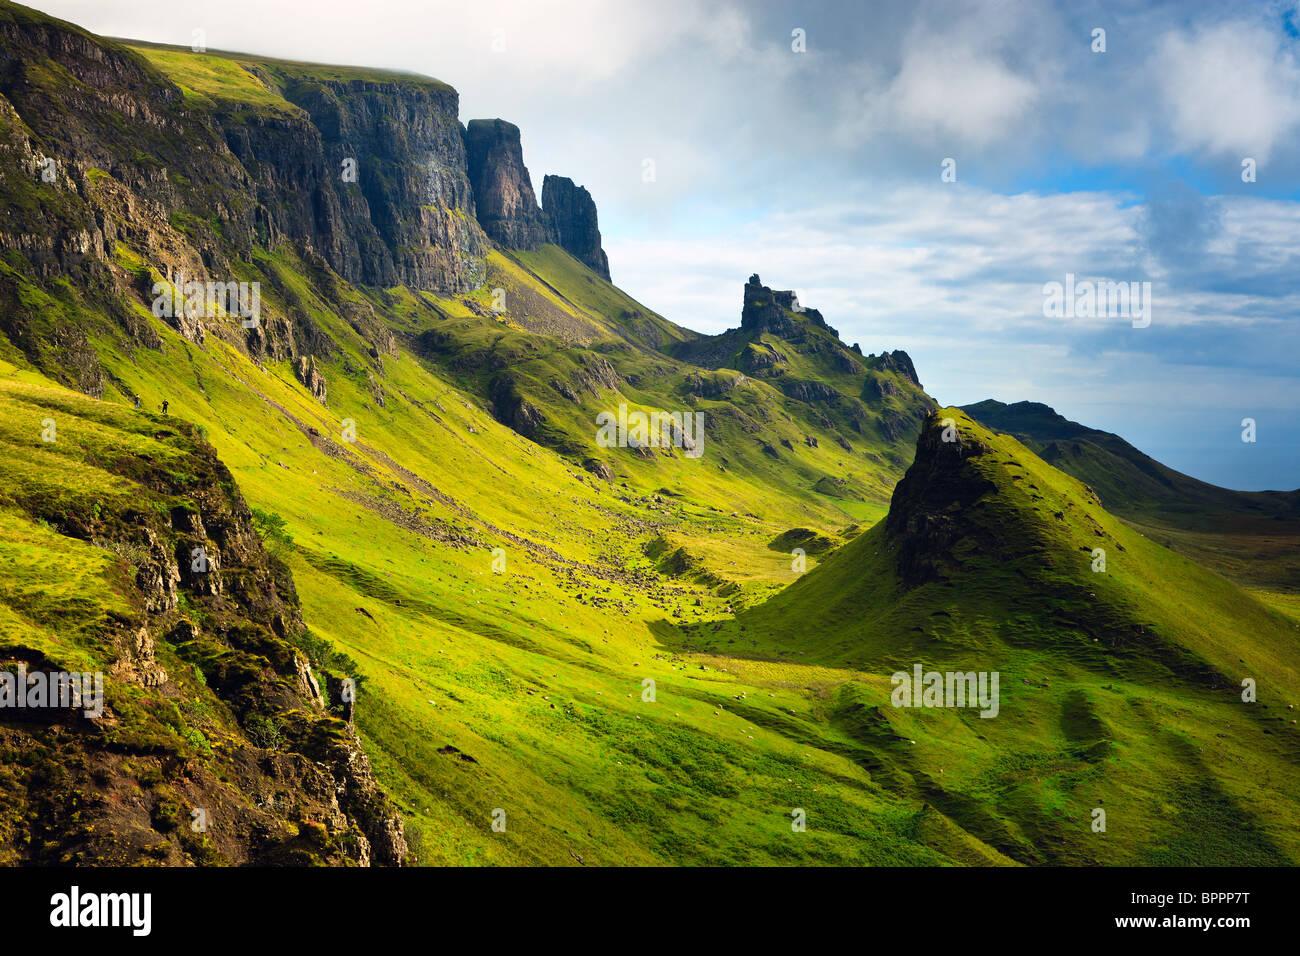 Vista sobre el Quiraing, Isla de Skye, Escocia Imagen De Stock